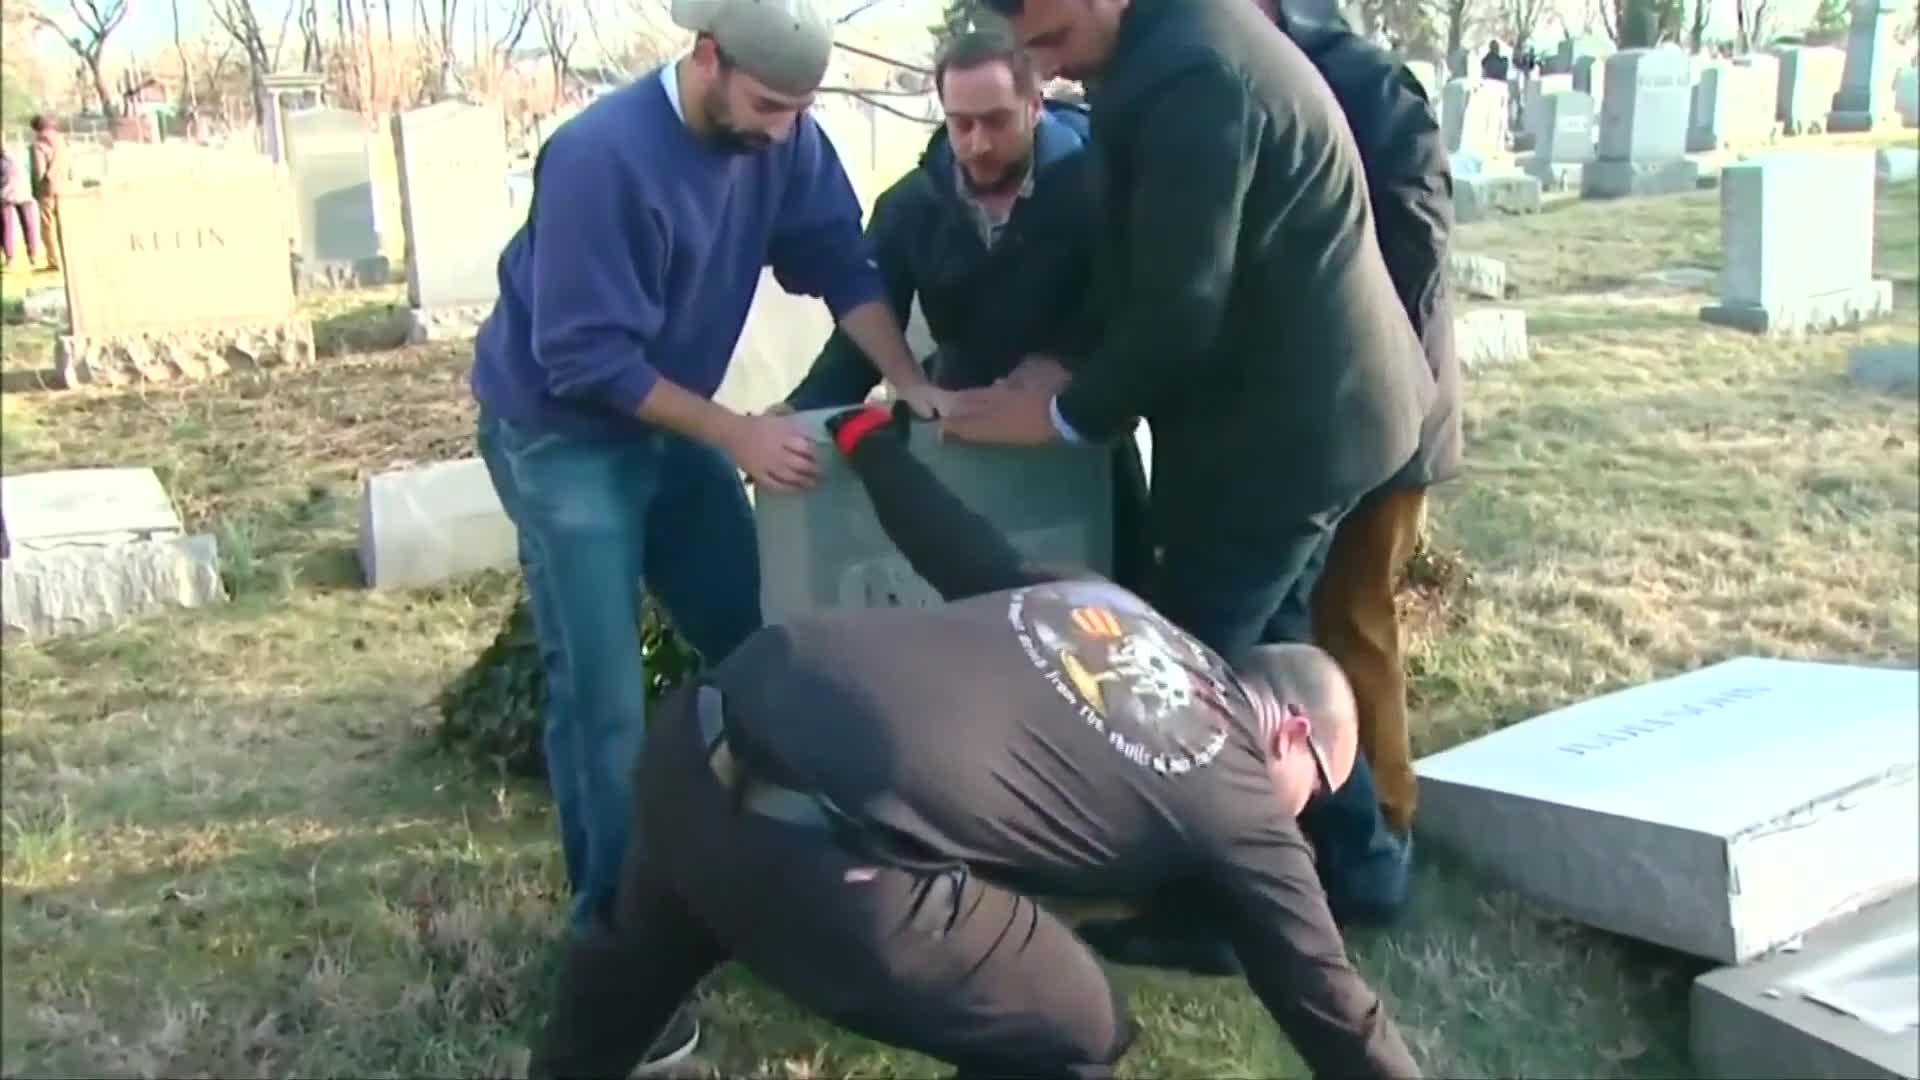 Muslim Activists Promise To Help Rebuild Second Vandalized Jewish Cemetery